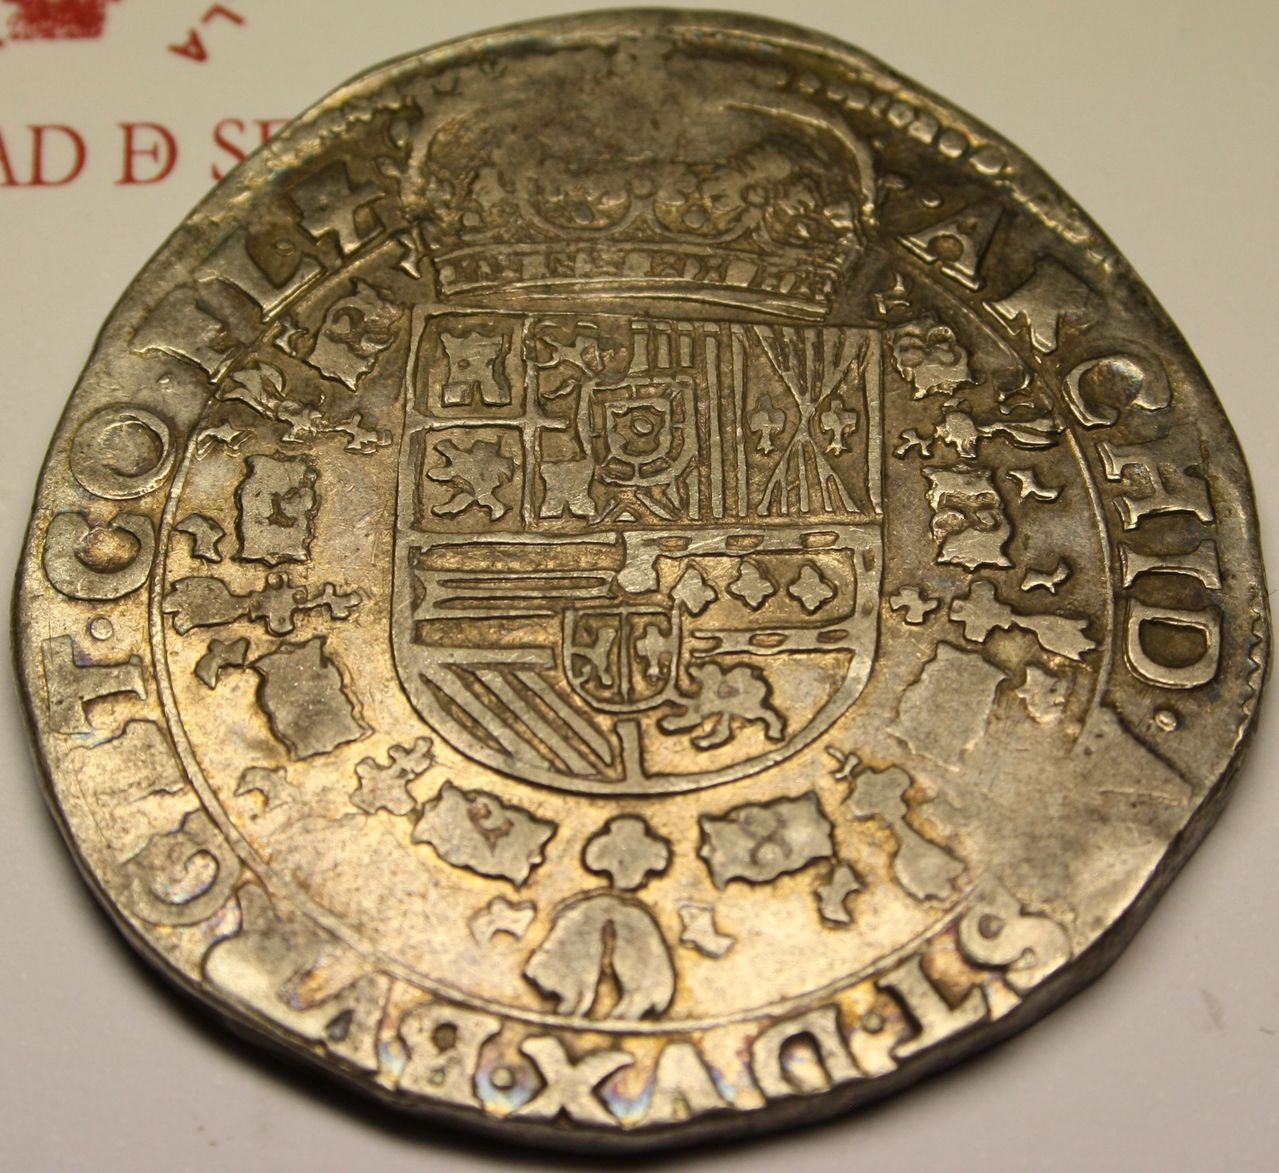 Patagón de 1623. Felipe IV, Flandes, dedicado a Poiss y a Jorge Reverso